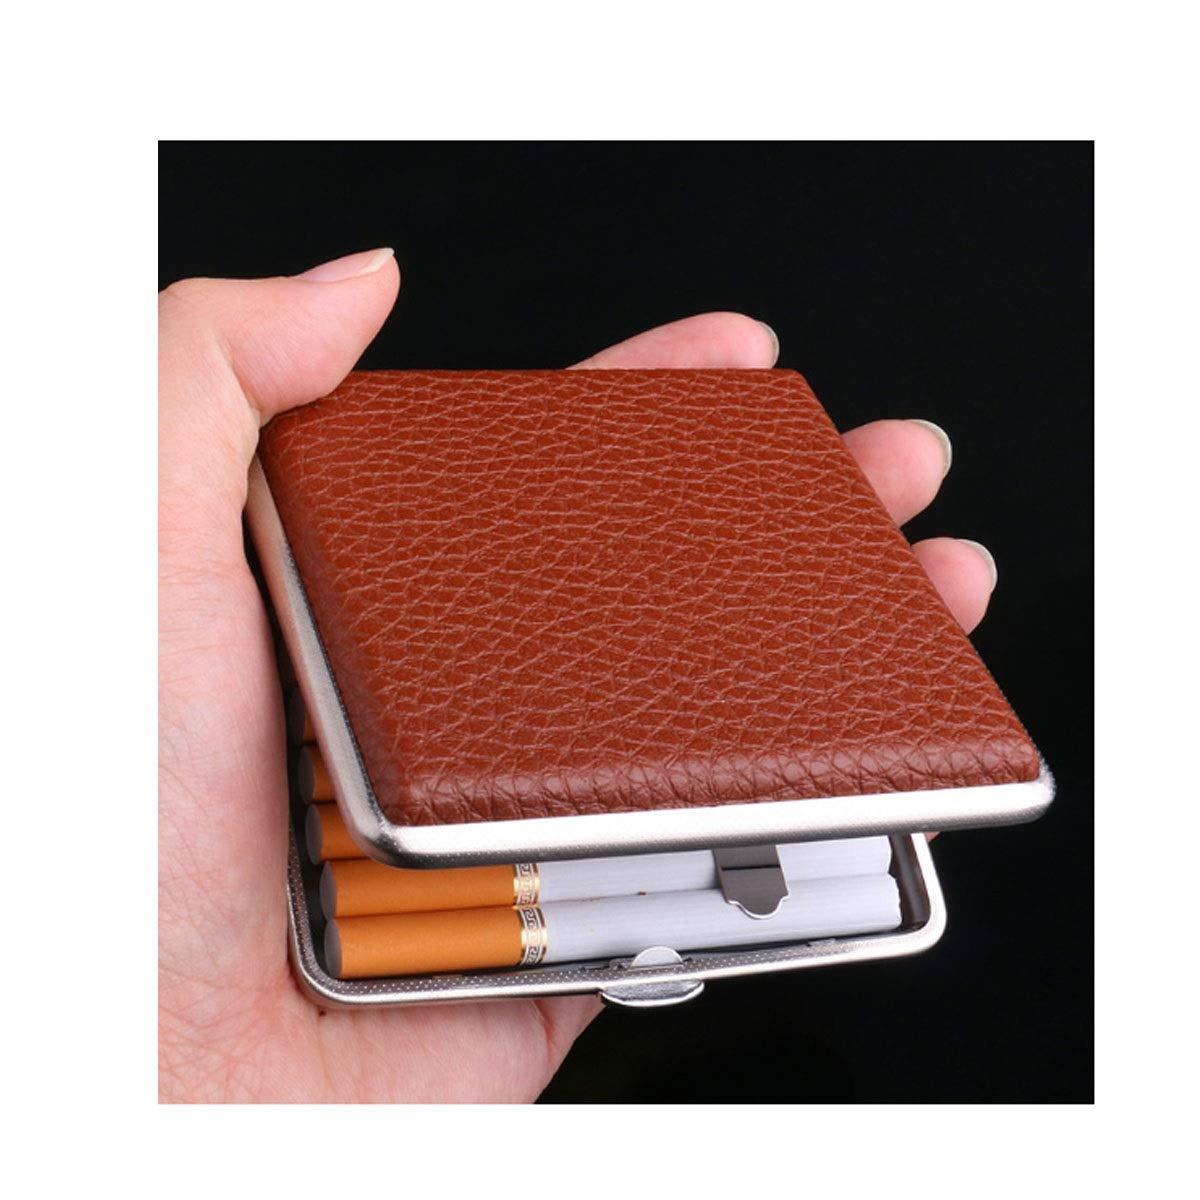 HUIJUNWENTI Cigarette Box, Ultra-Thin Simple Men's Cigarette Case, 20 Packs, Portable Leather Metal Cigarette Holder, Personalized Gifts (Size : Brown)